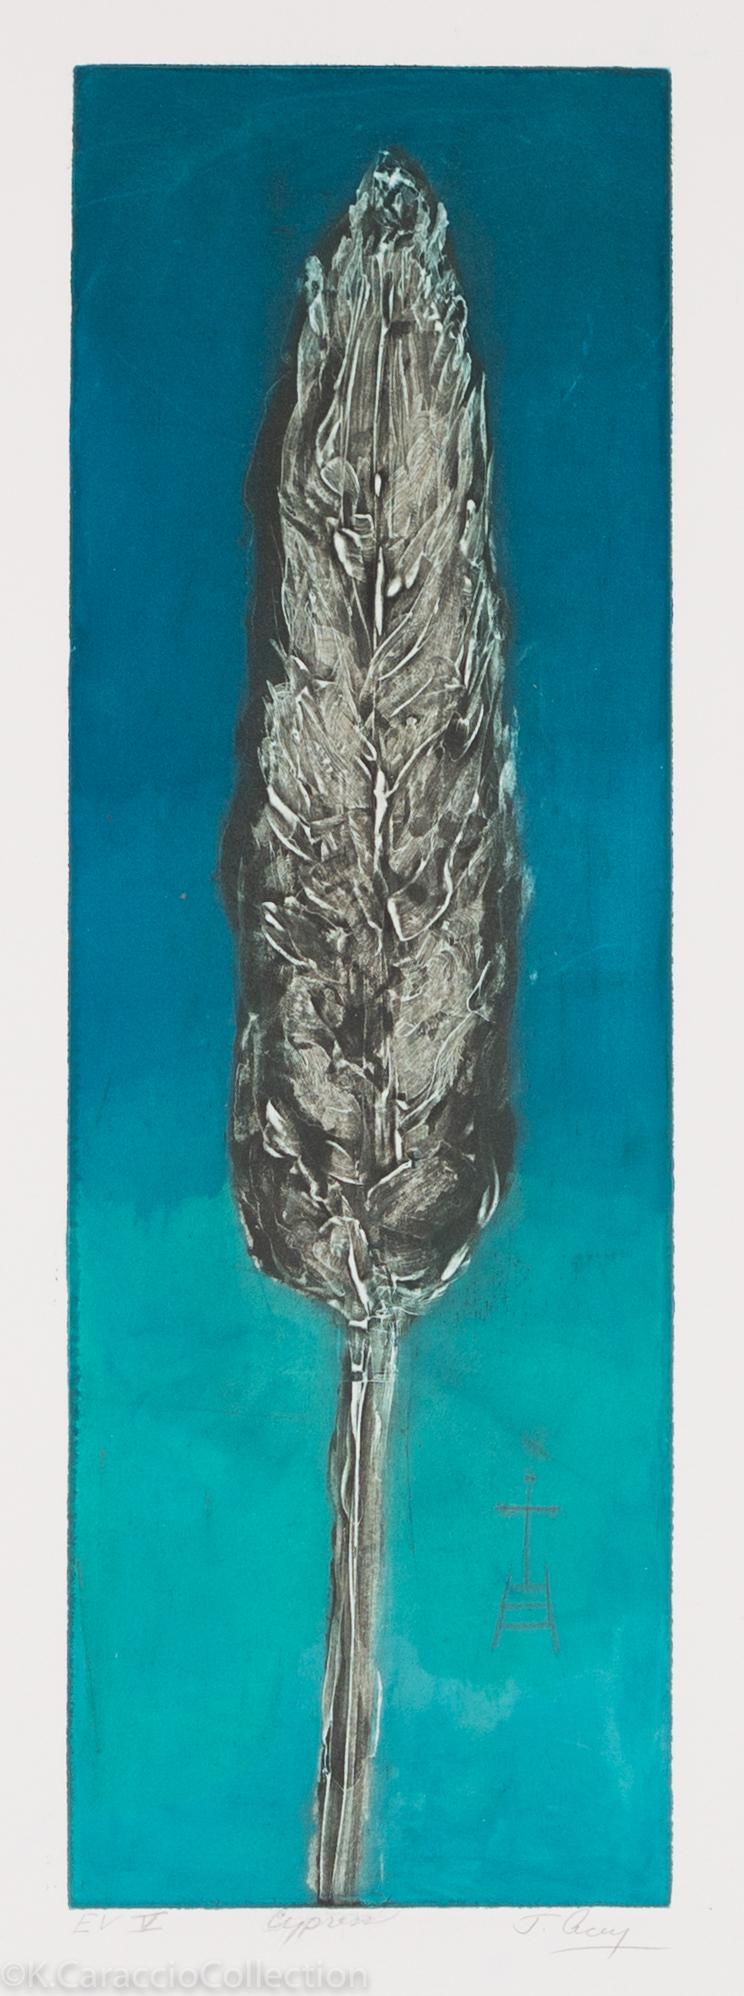 Cypress, 2007